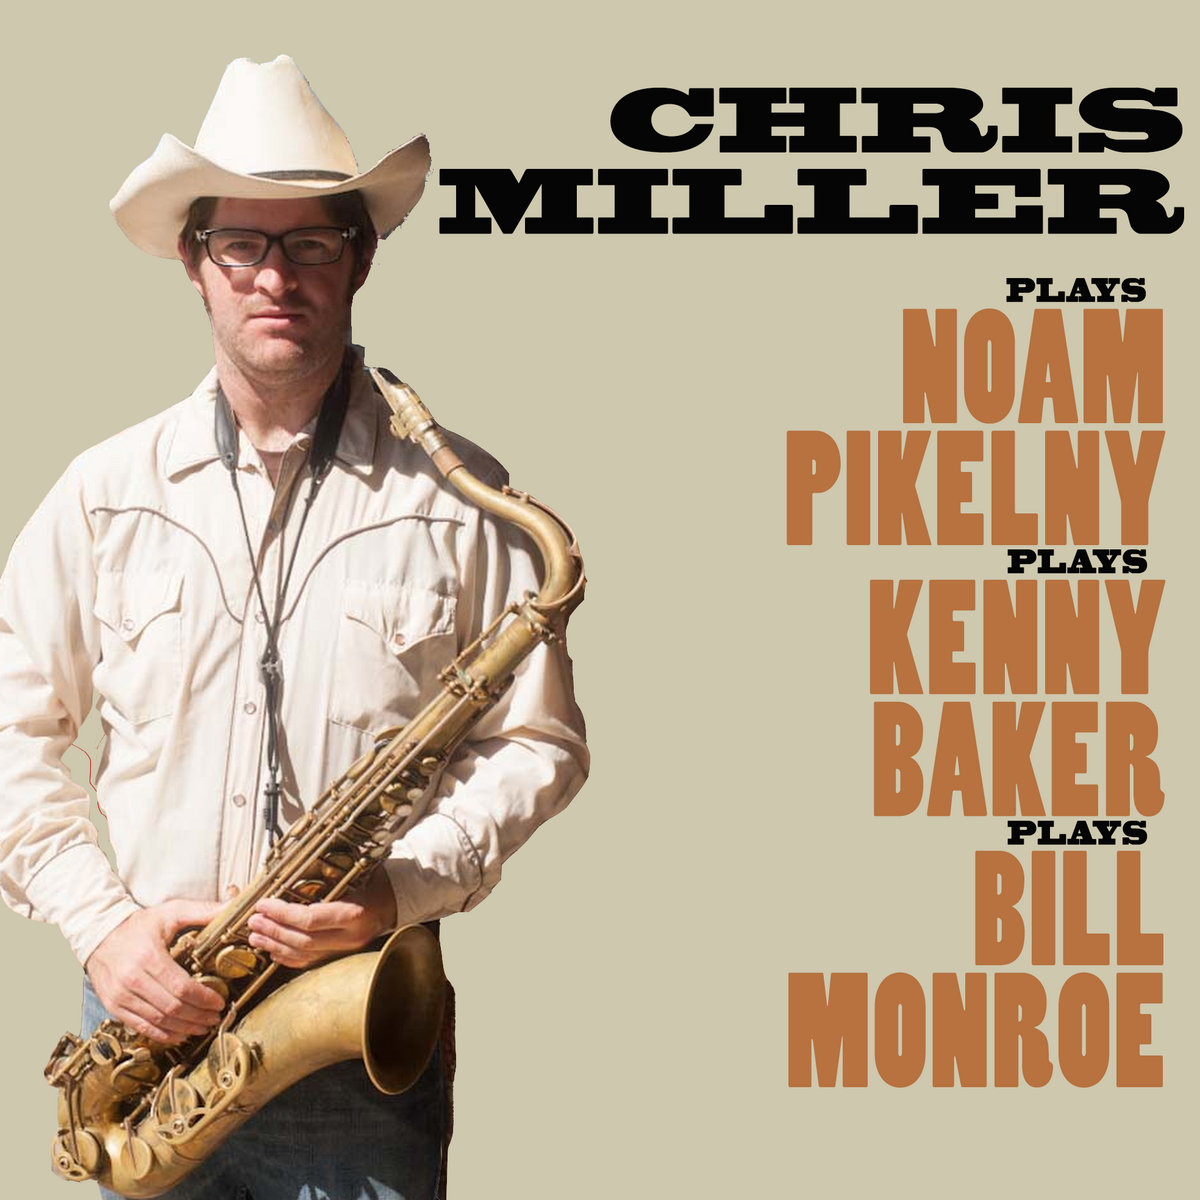 Chris Miller Plays Noam Pikelny Plays Kenny Baker Plays Bill